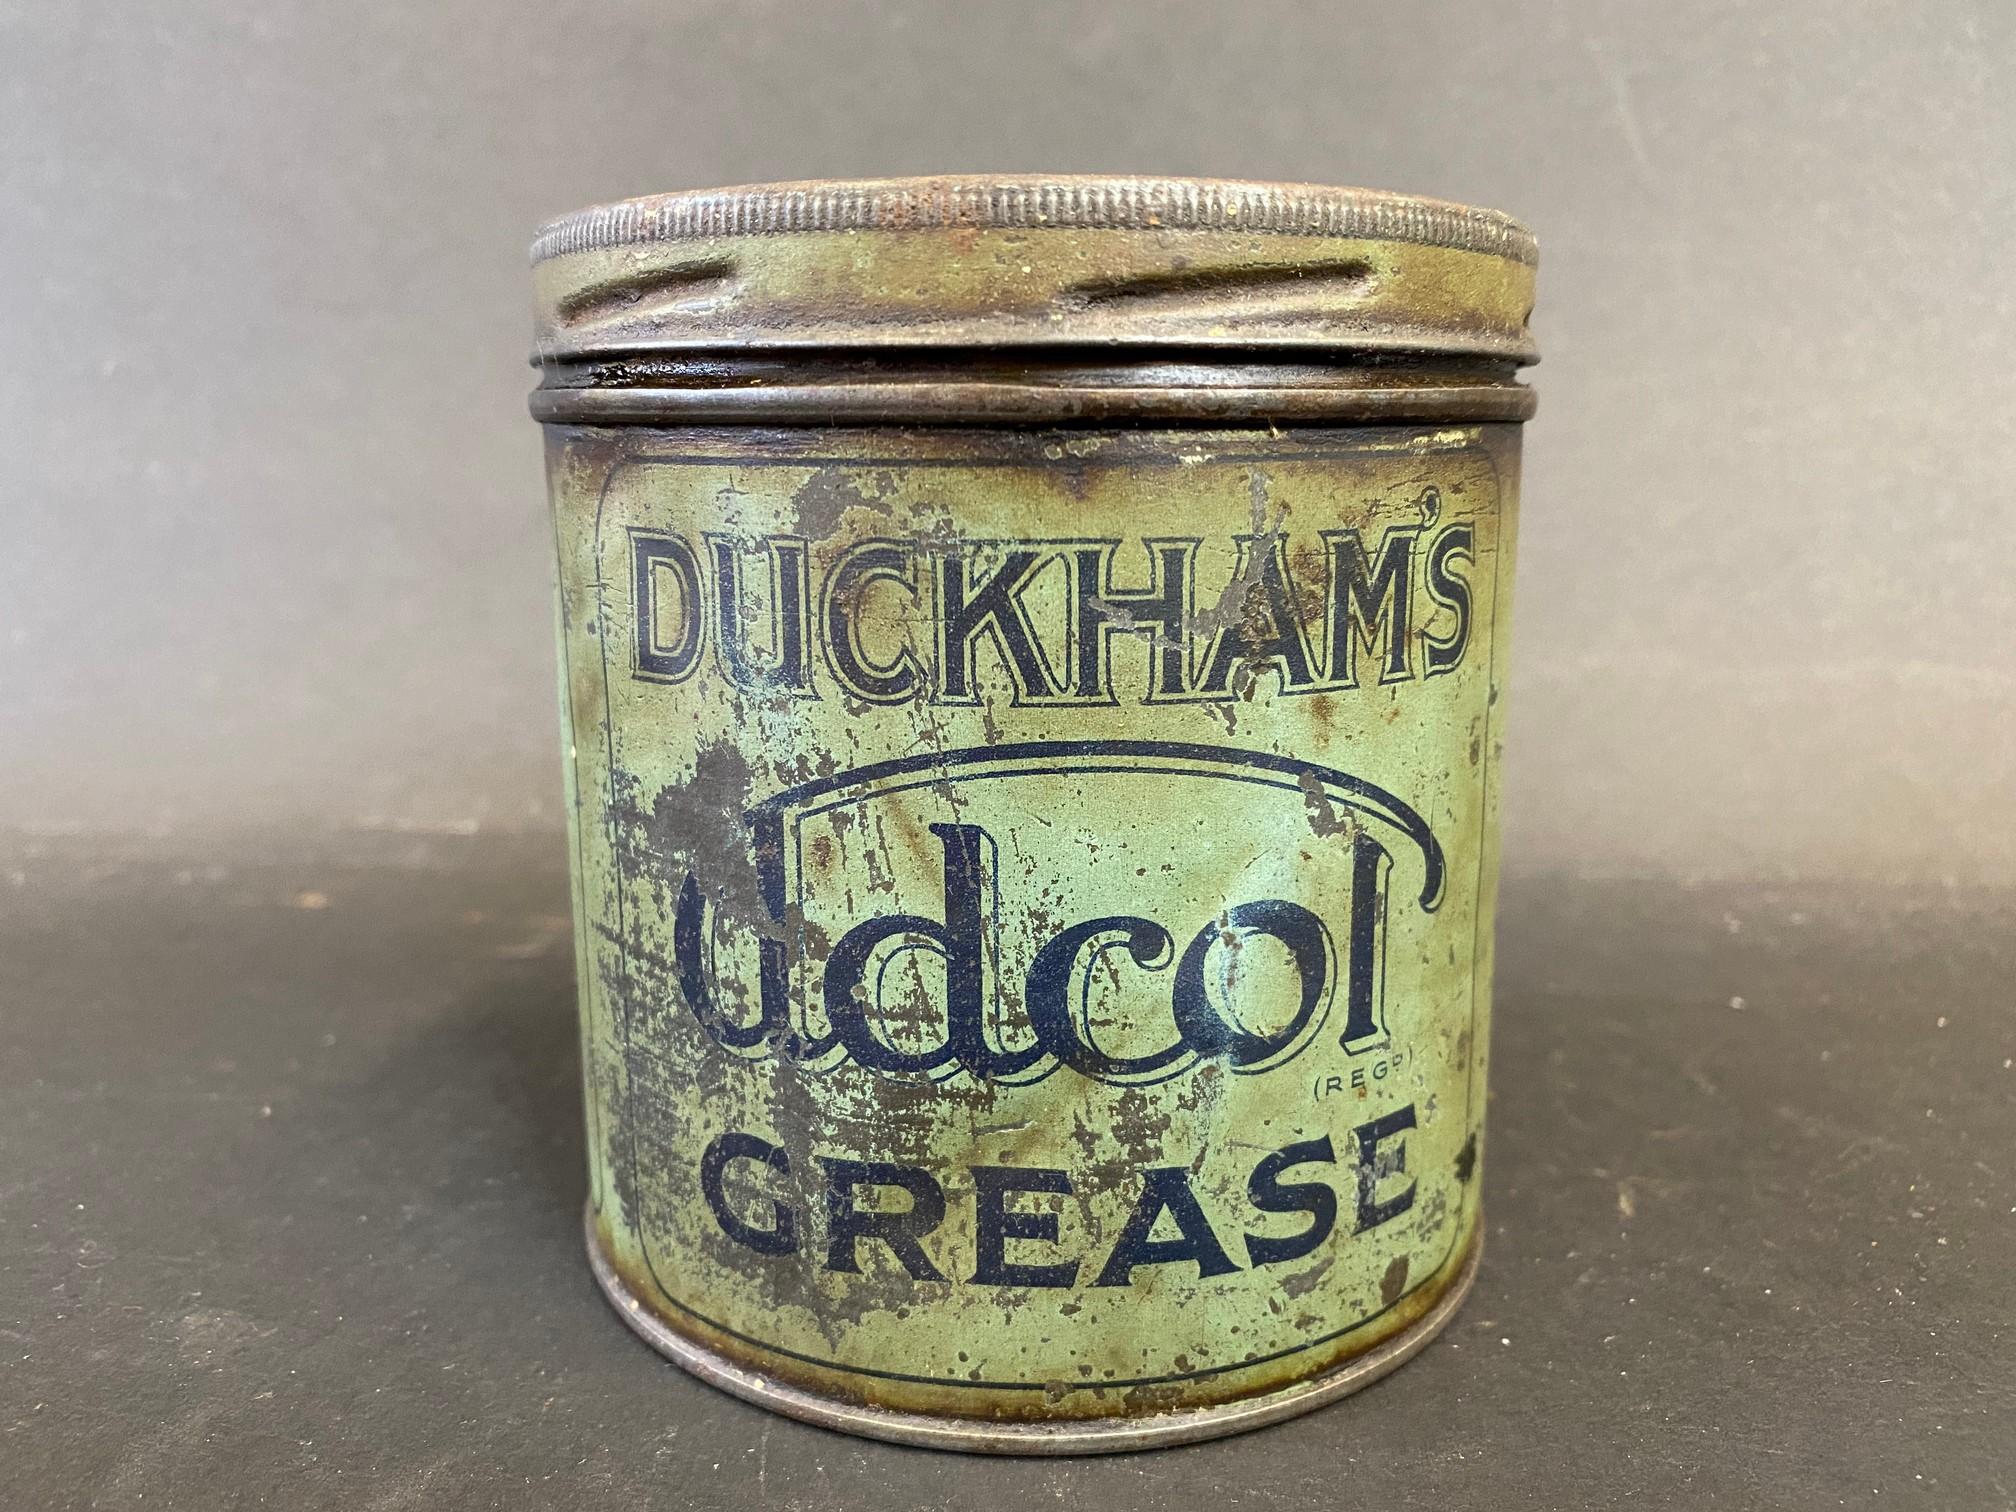 A Duckham's Adcol grease tin.